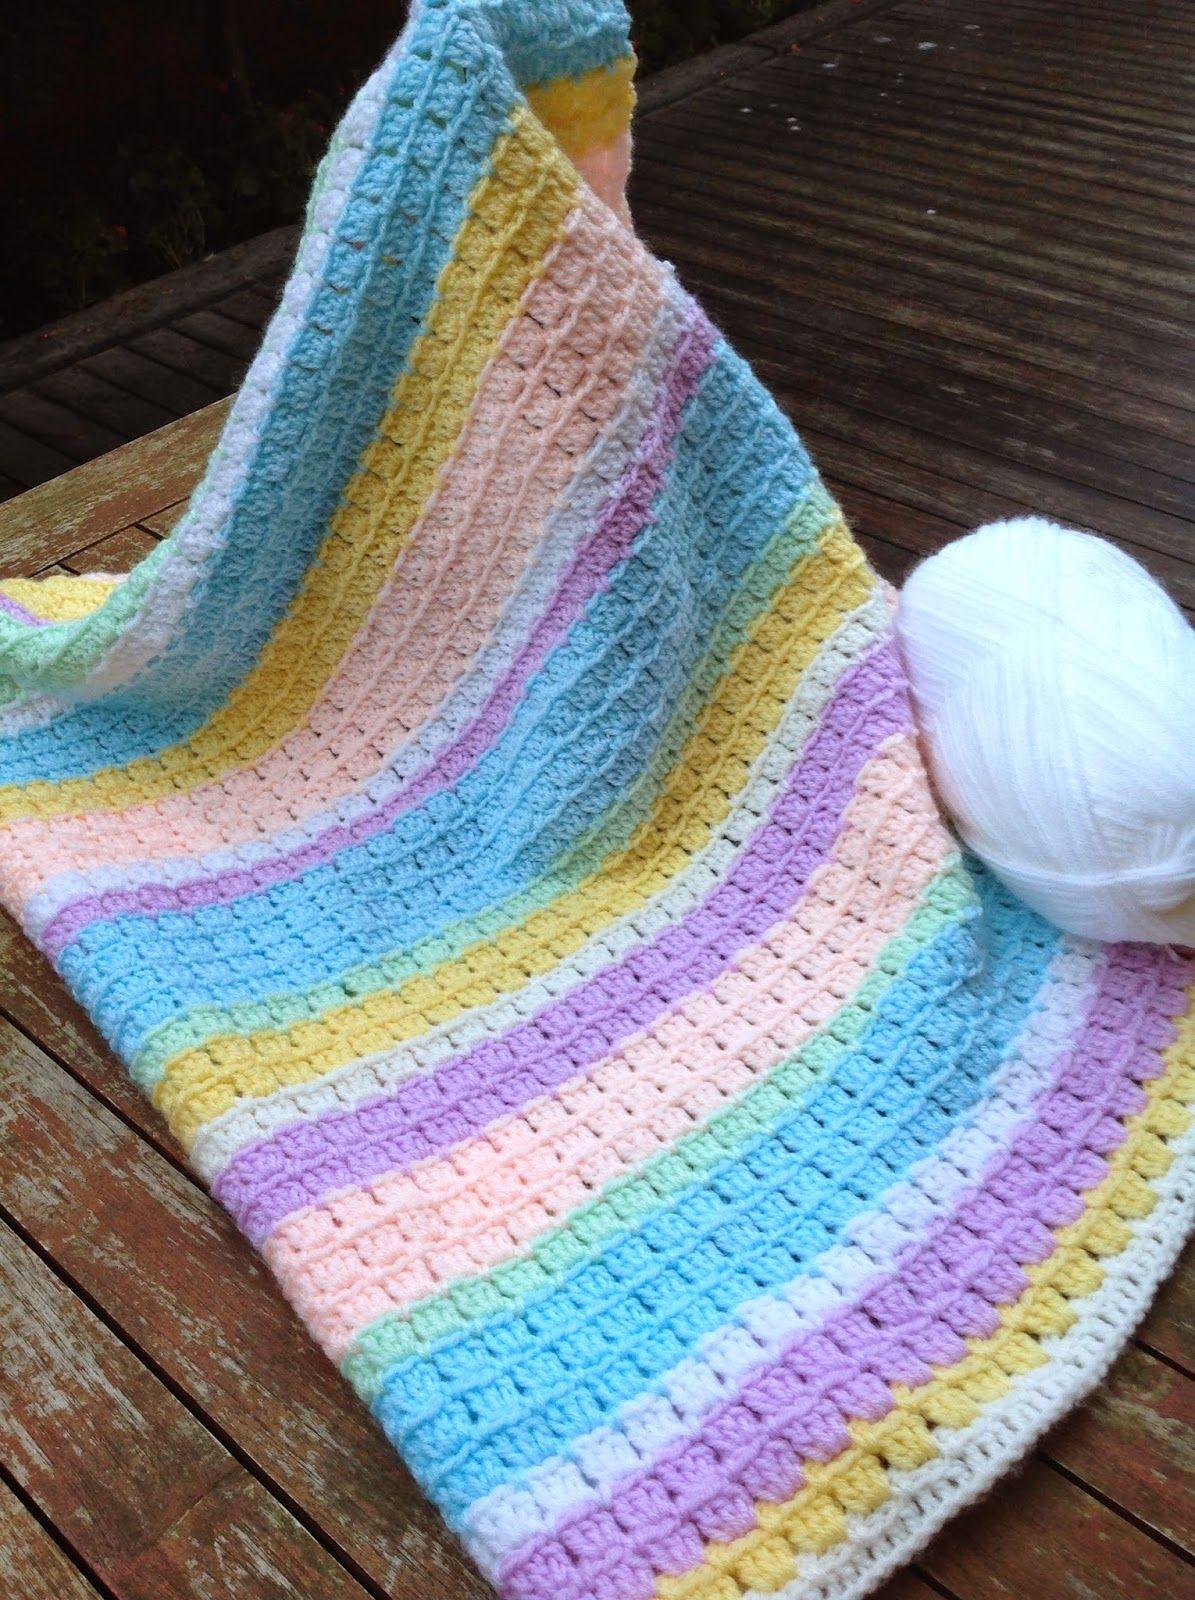 Oyas world crochet knitting crochet block stitch baby blanket free pattern adorable block stitch baby blanket knit and crochet daily bankloansurffo Image collections